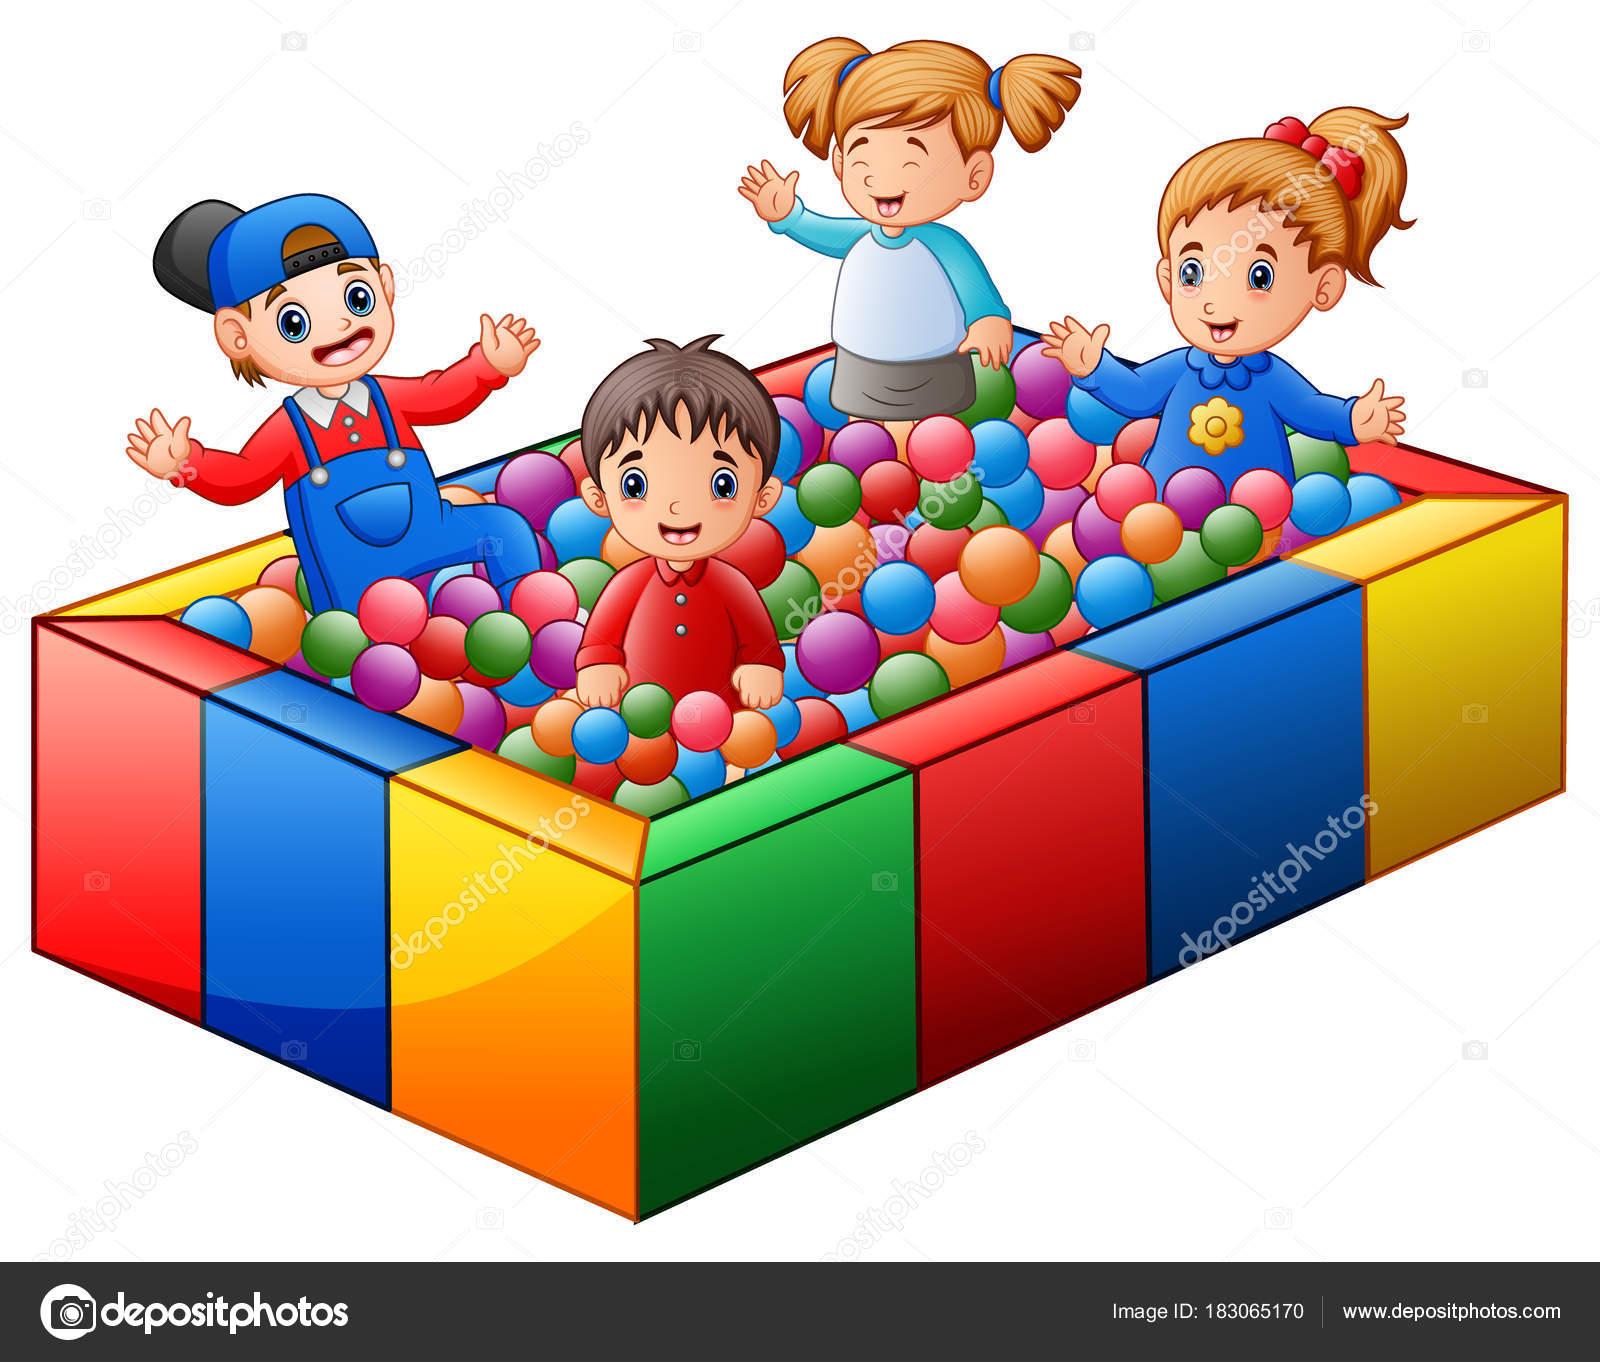 Dibujo piscina de bolas ilustraci n vectorial ni os jugando piscina bolas coloridas vector - Piscina de bolas para bebes ...